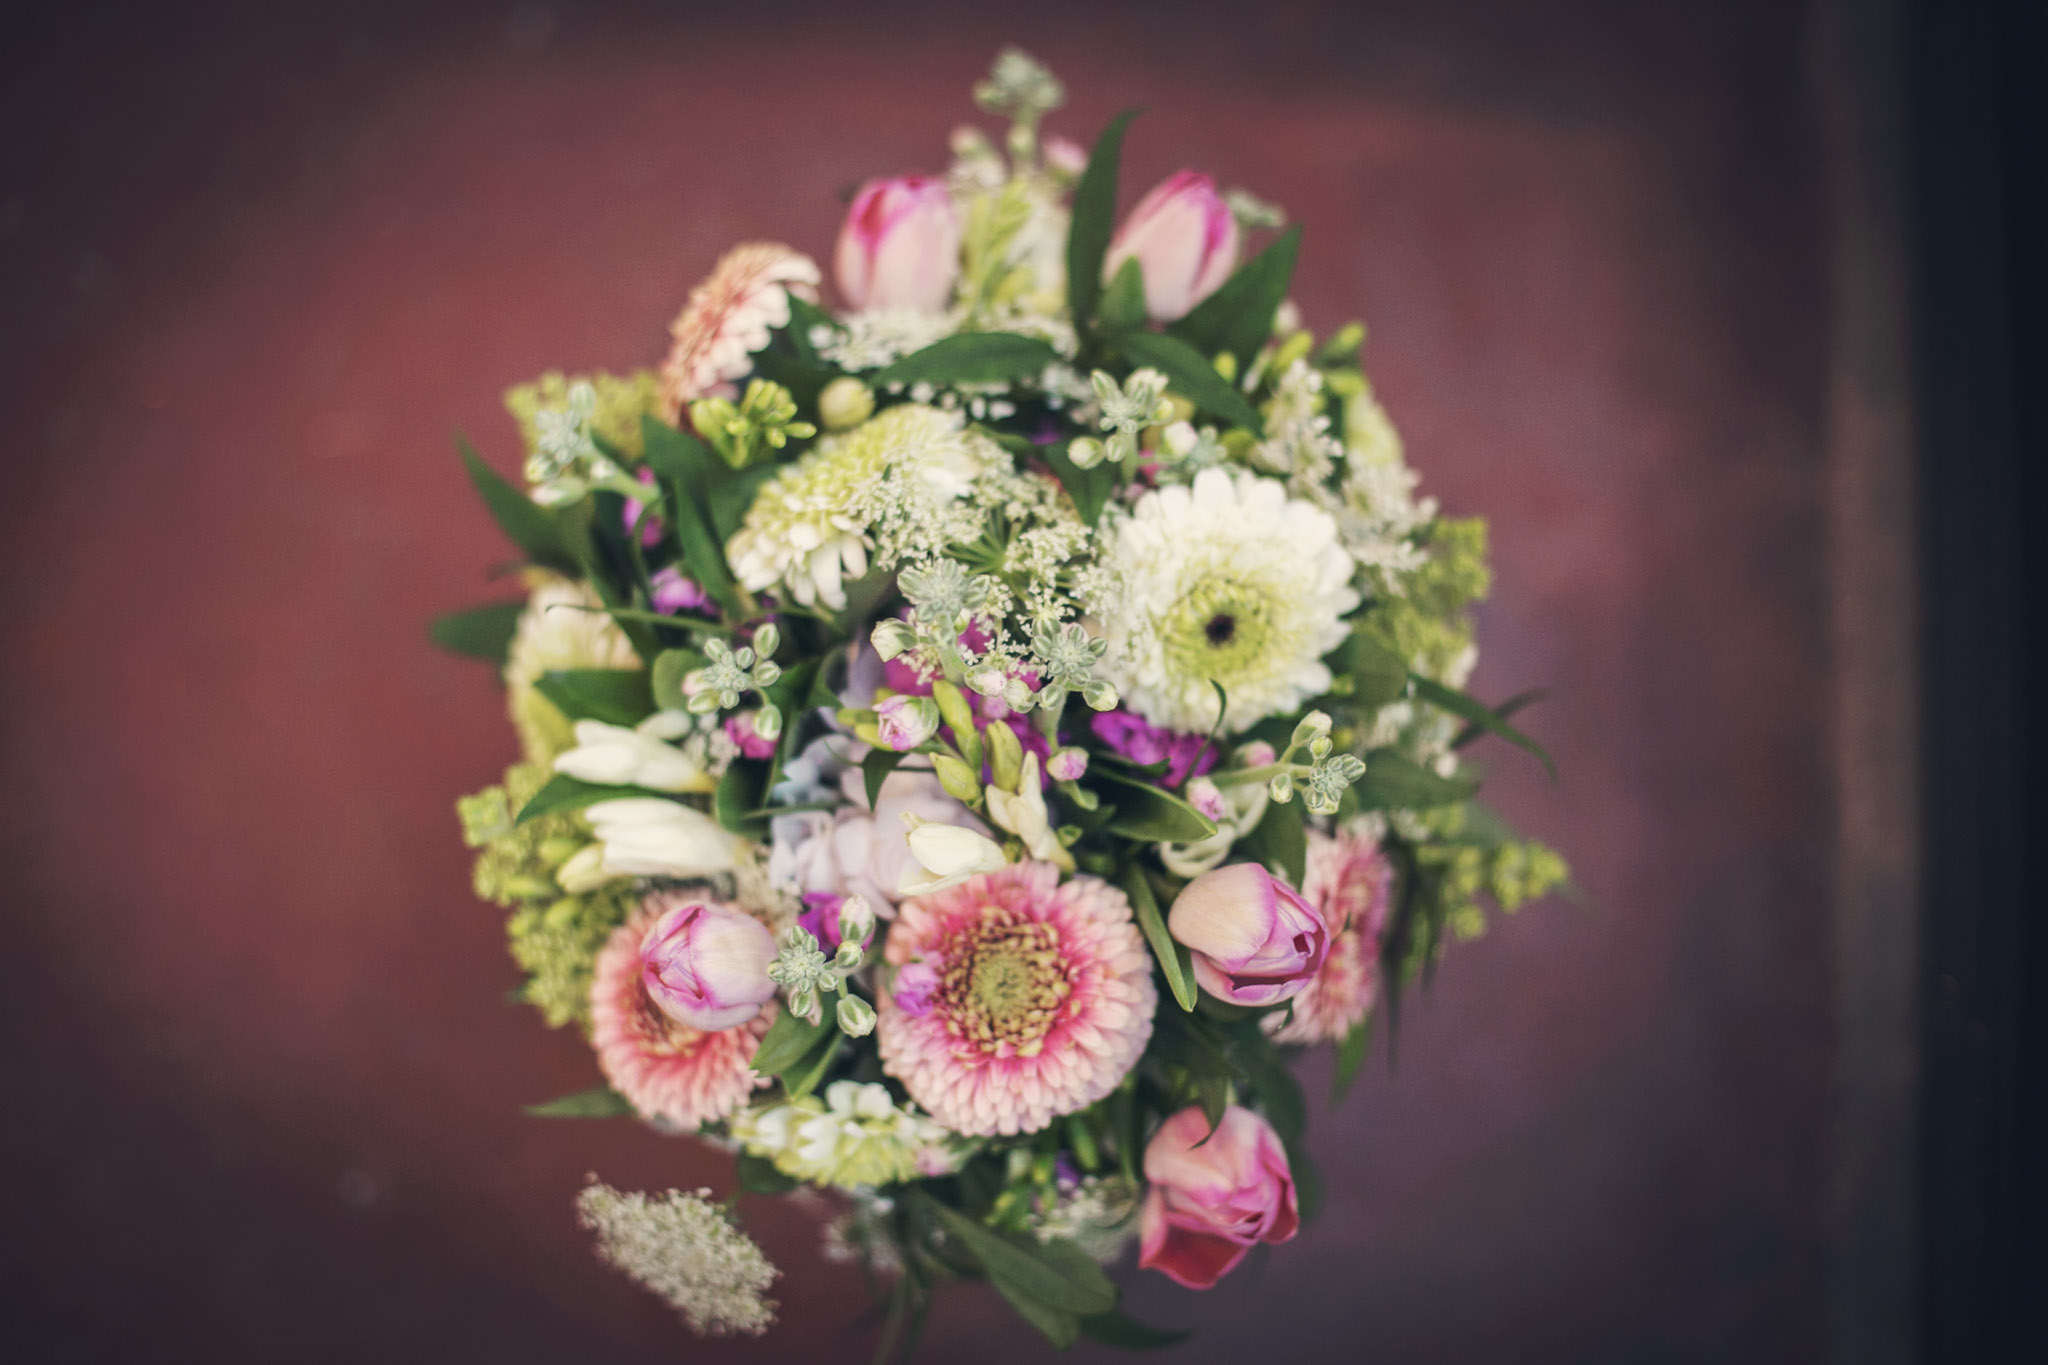 Kansas_City_Small_Wedding_Venue_Elope_Intimate_Ceremony_Budget_Affordable_Sophie&Philip_010b.jpg